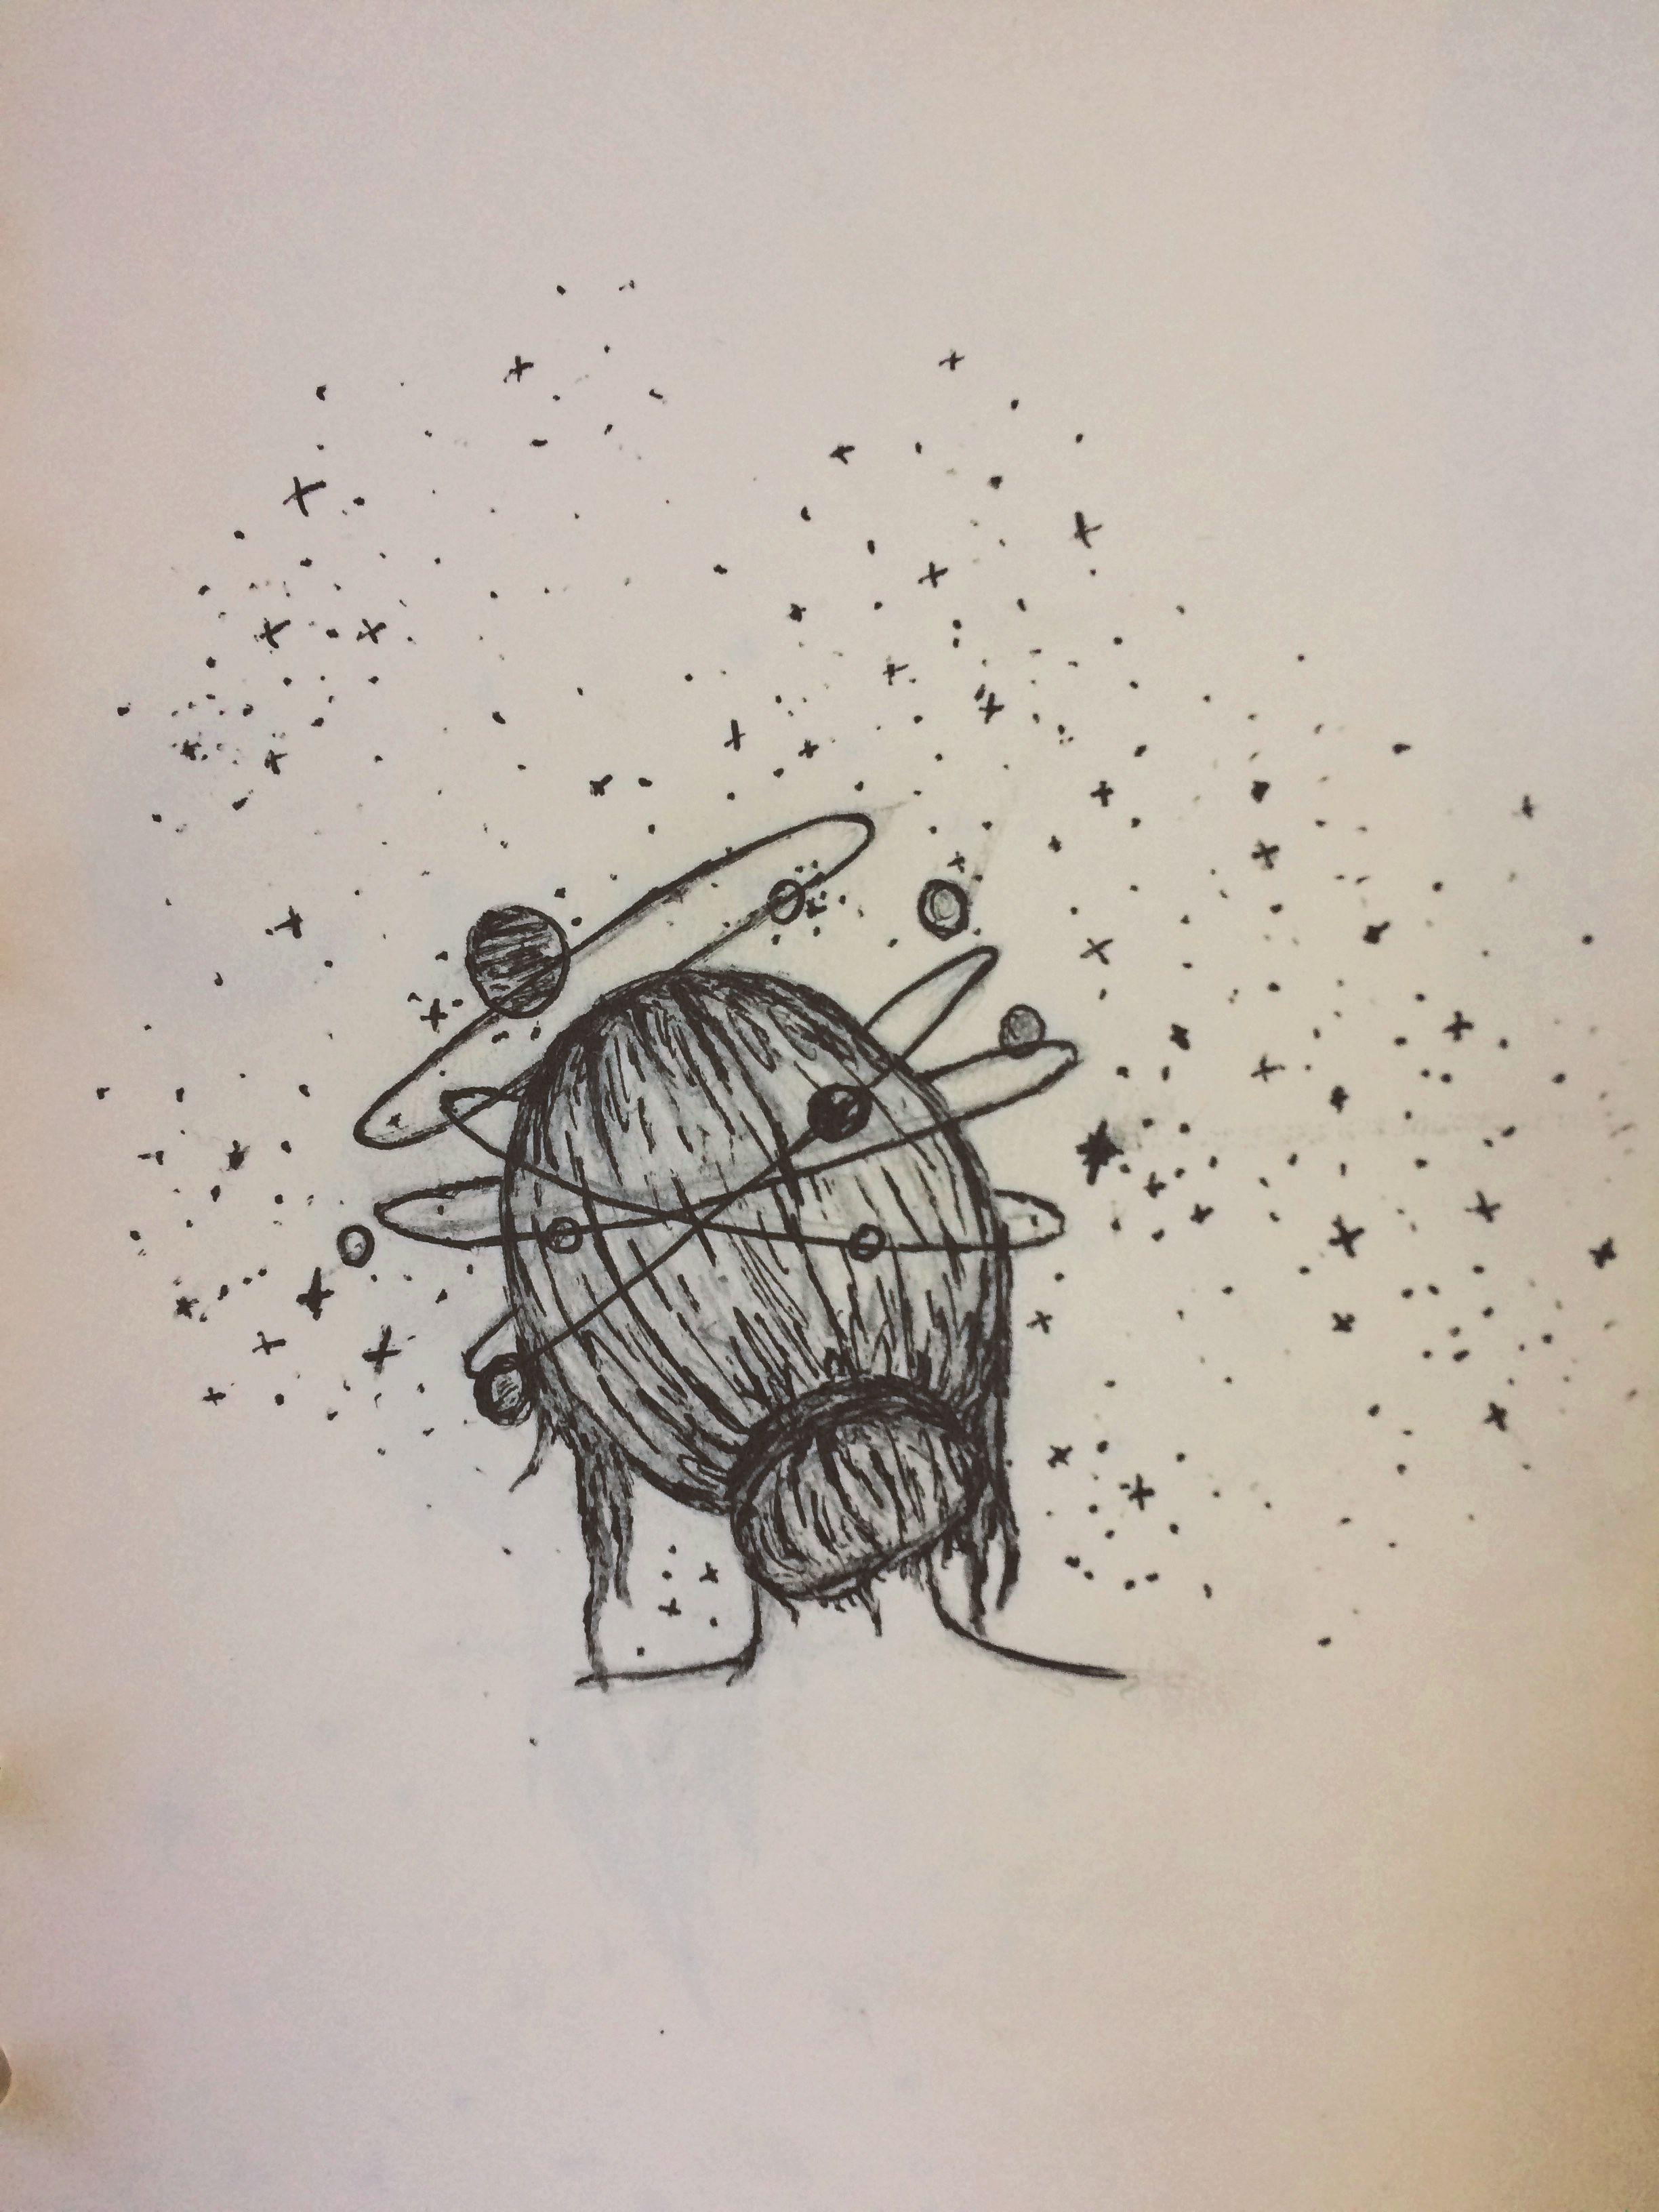 Thoughts Drawing : thoughts, drawing, Thought., #draw, #penart, #sketches, #drawings, #space, #artwork, #doodles, Galaxy, Drawings,, Space, Drawings